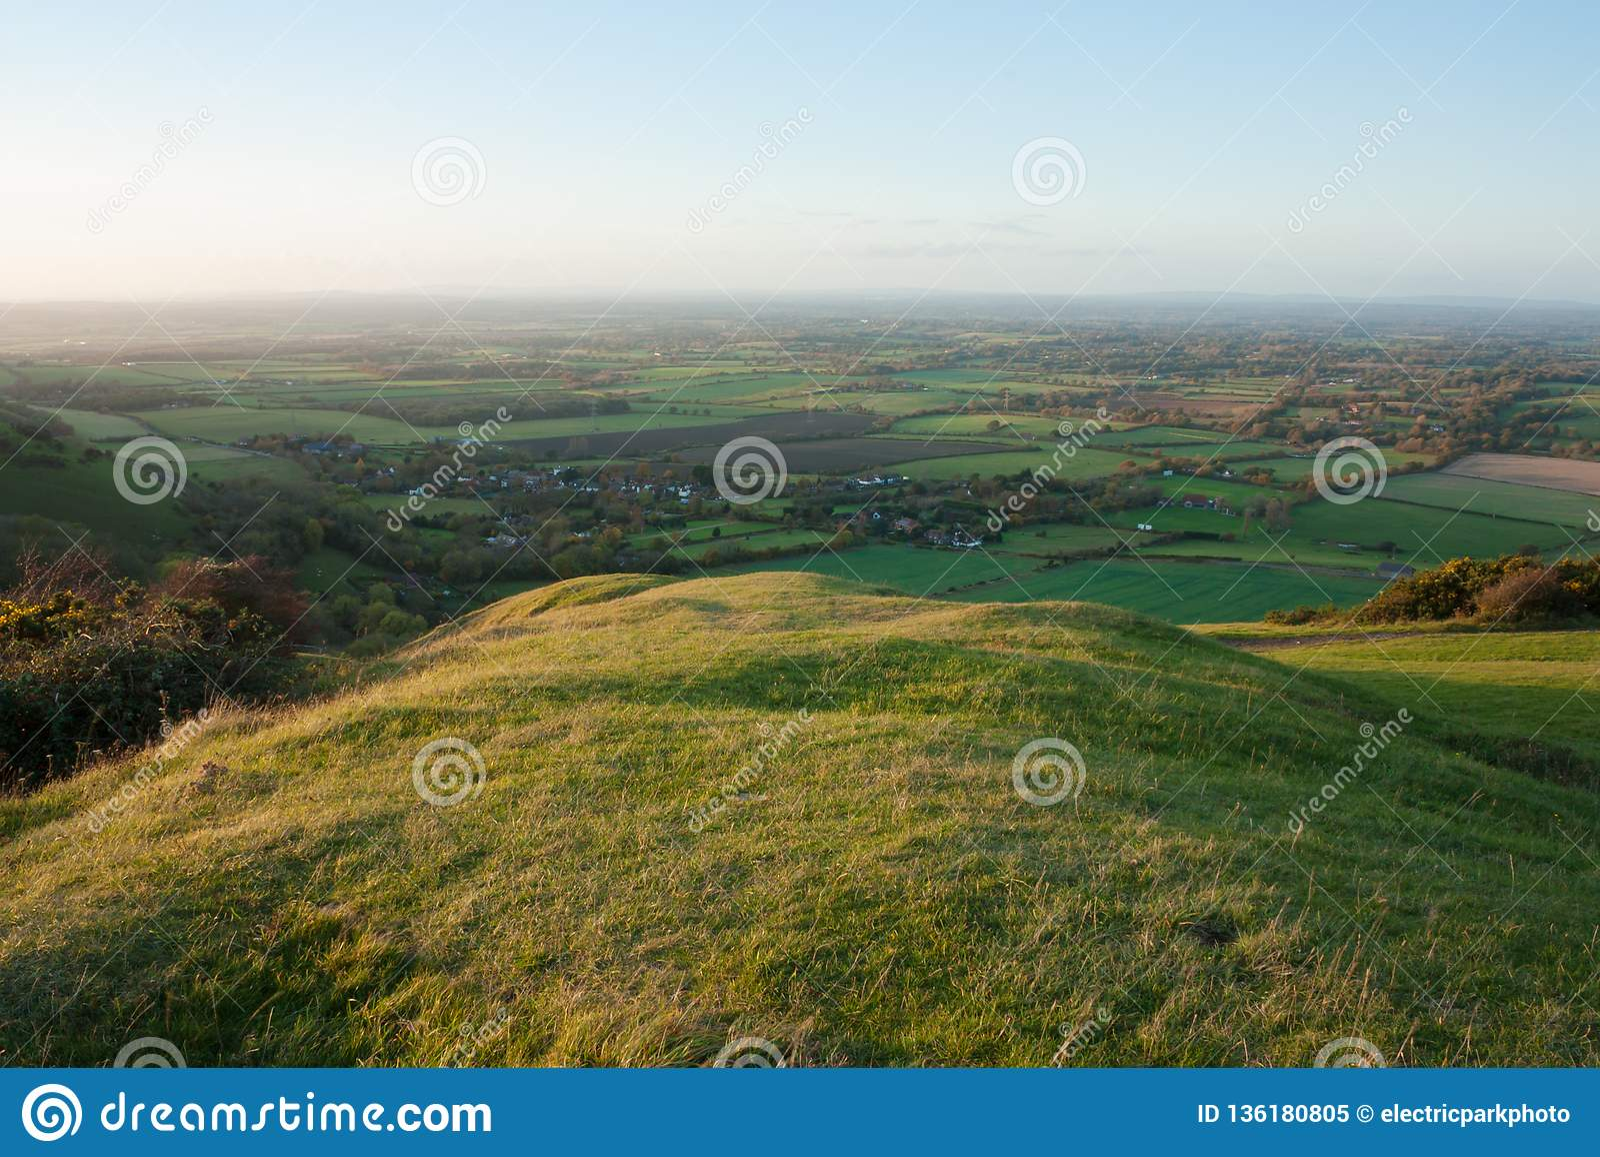 Regardant du nord des bas du sud, Fulking, East Sussex, R-U